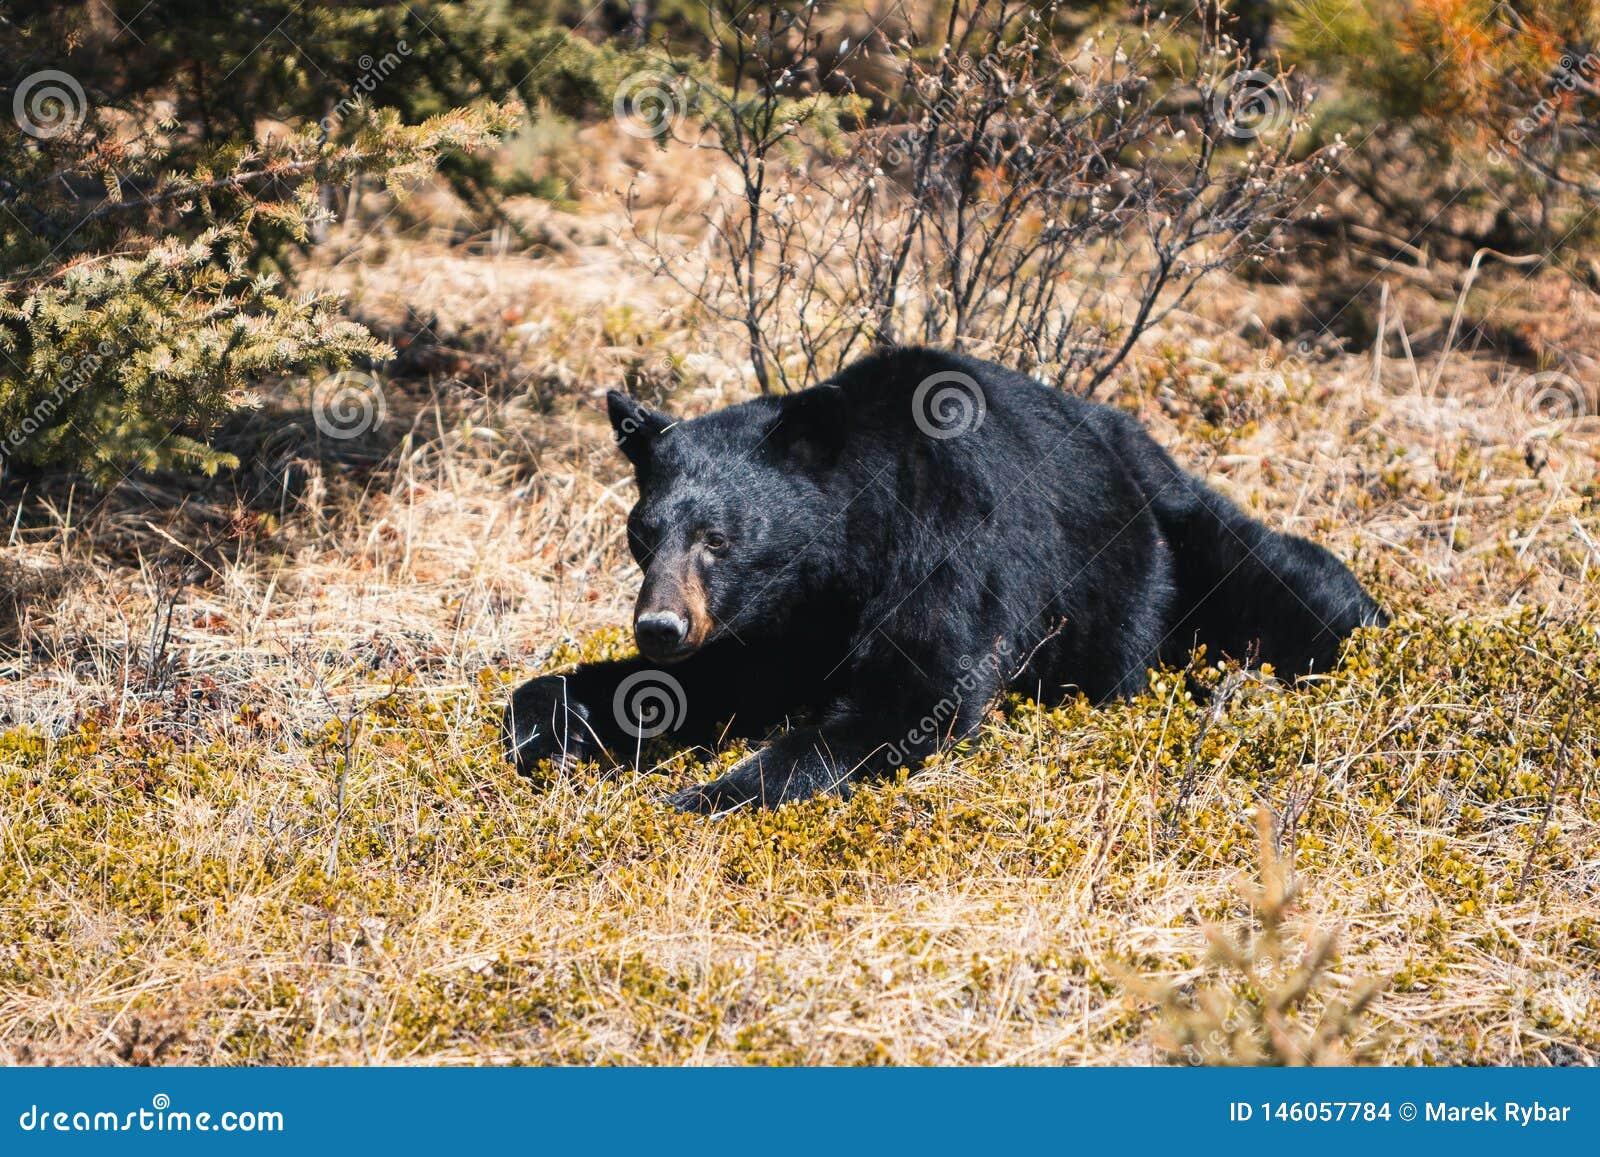 Jasper National Park, Alberta, Canada, black bear wanders, Travel Alberta, Canadian Rockies, Icefields parkway, Maligne Lake,